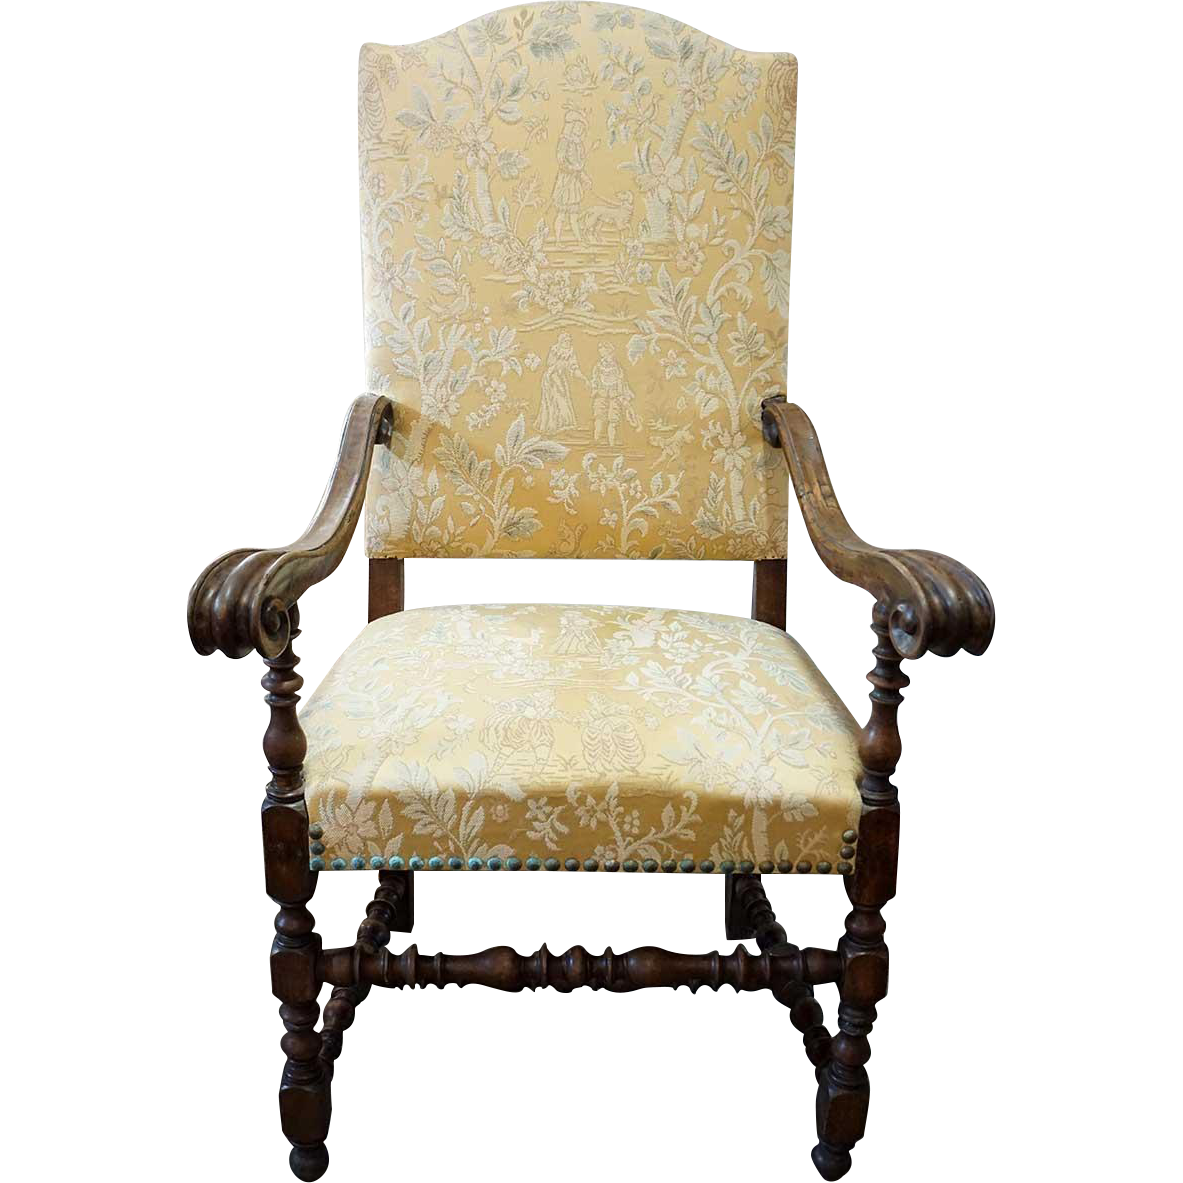 Italian/Spanish Baroque Walnut Upholstered Armchair